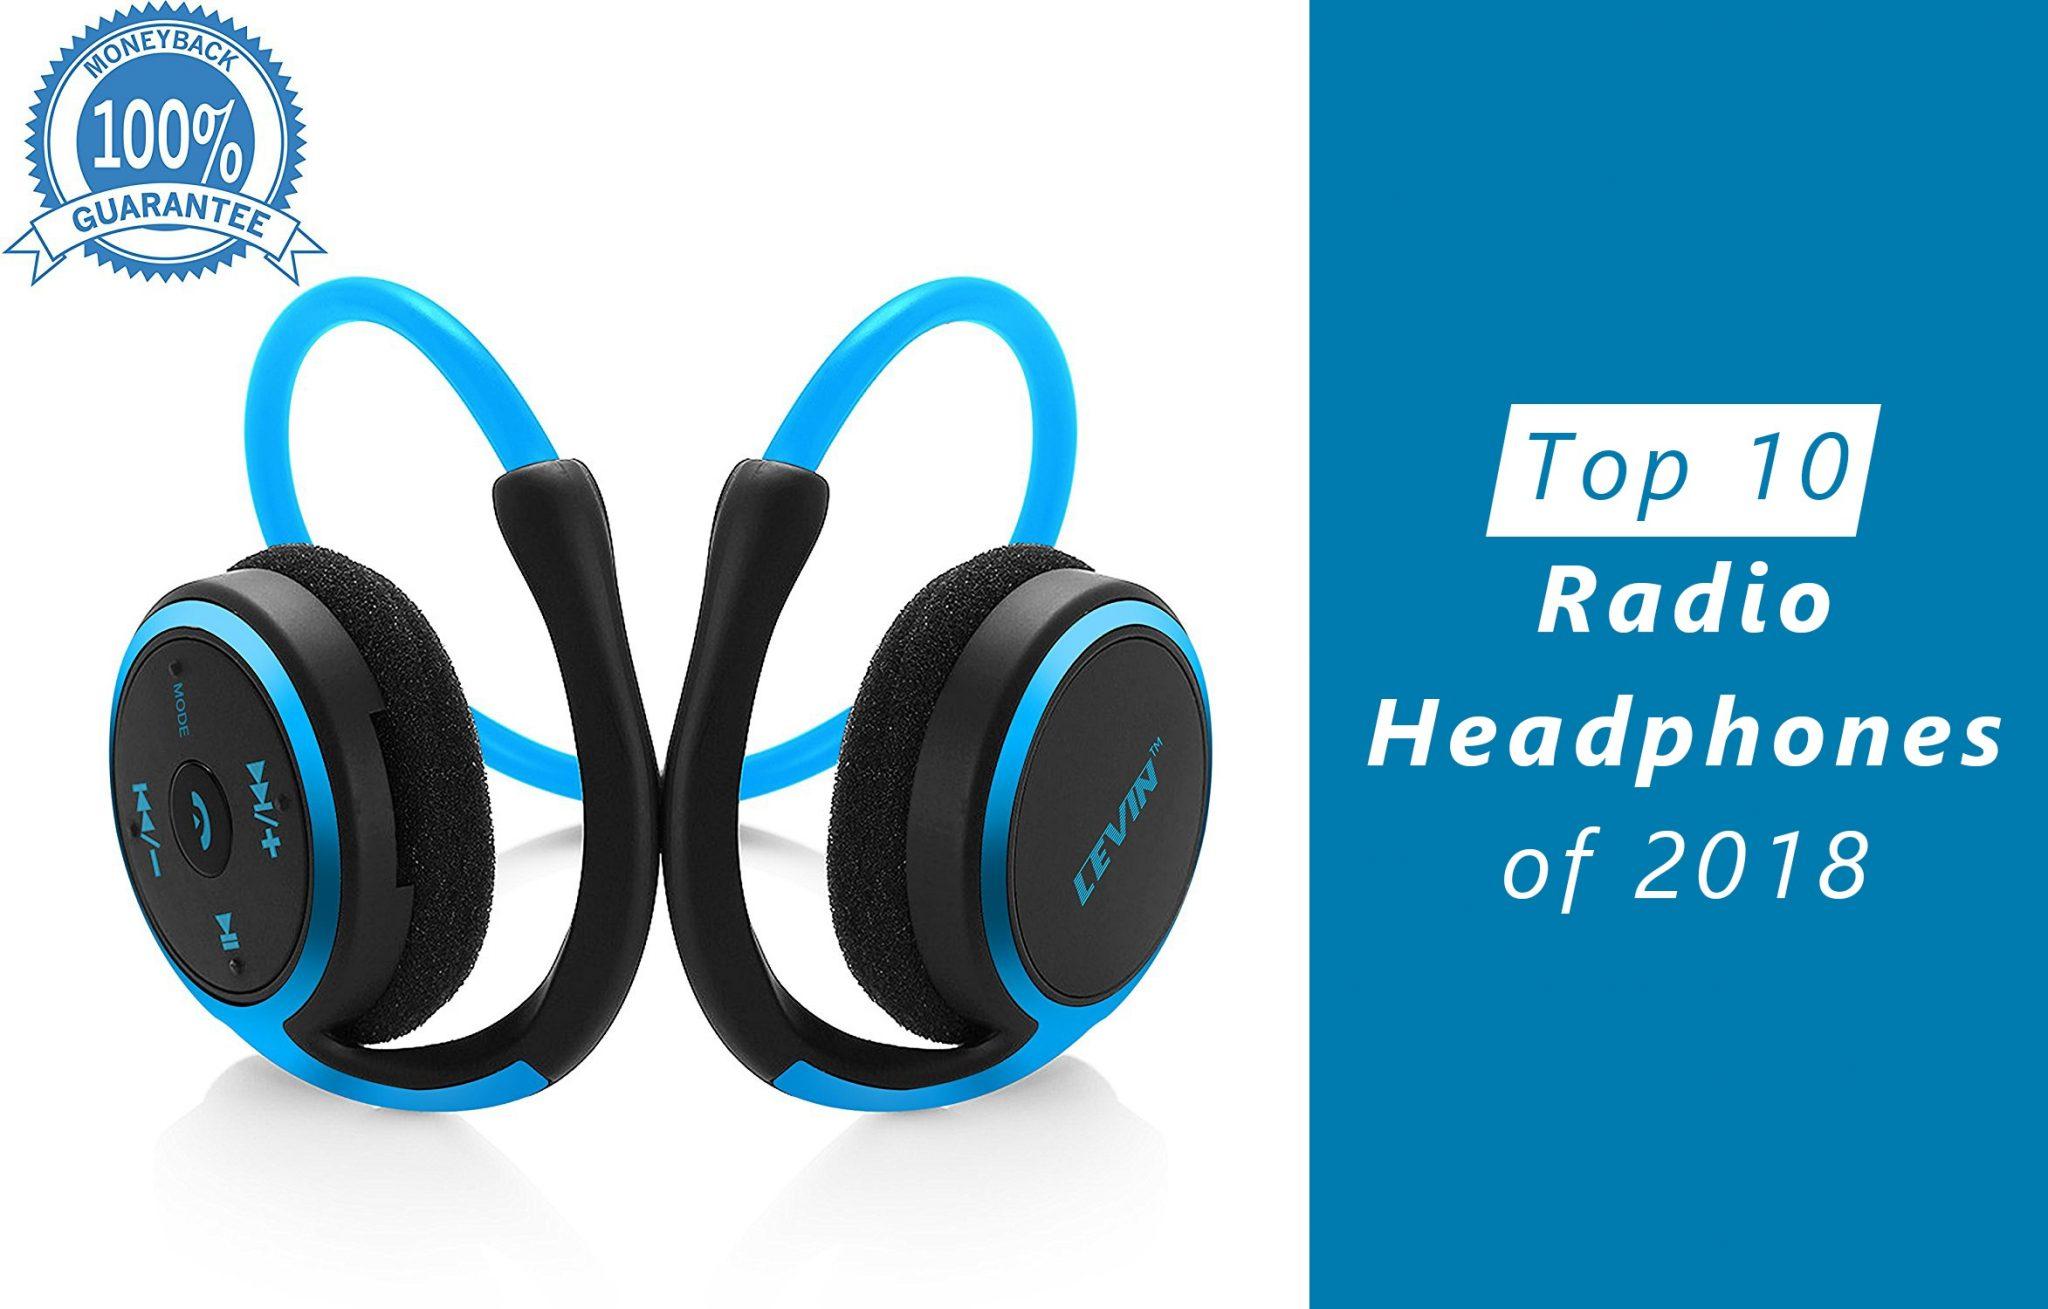 Top 10 Radio Headphones